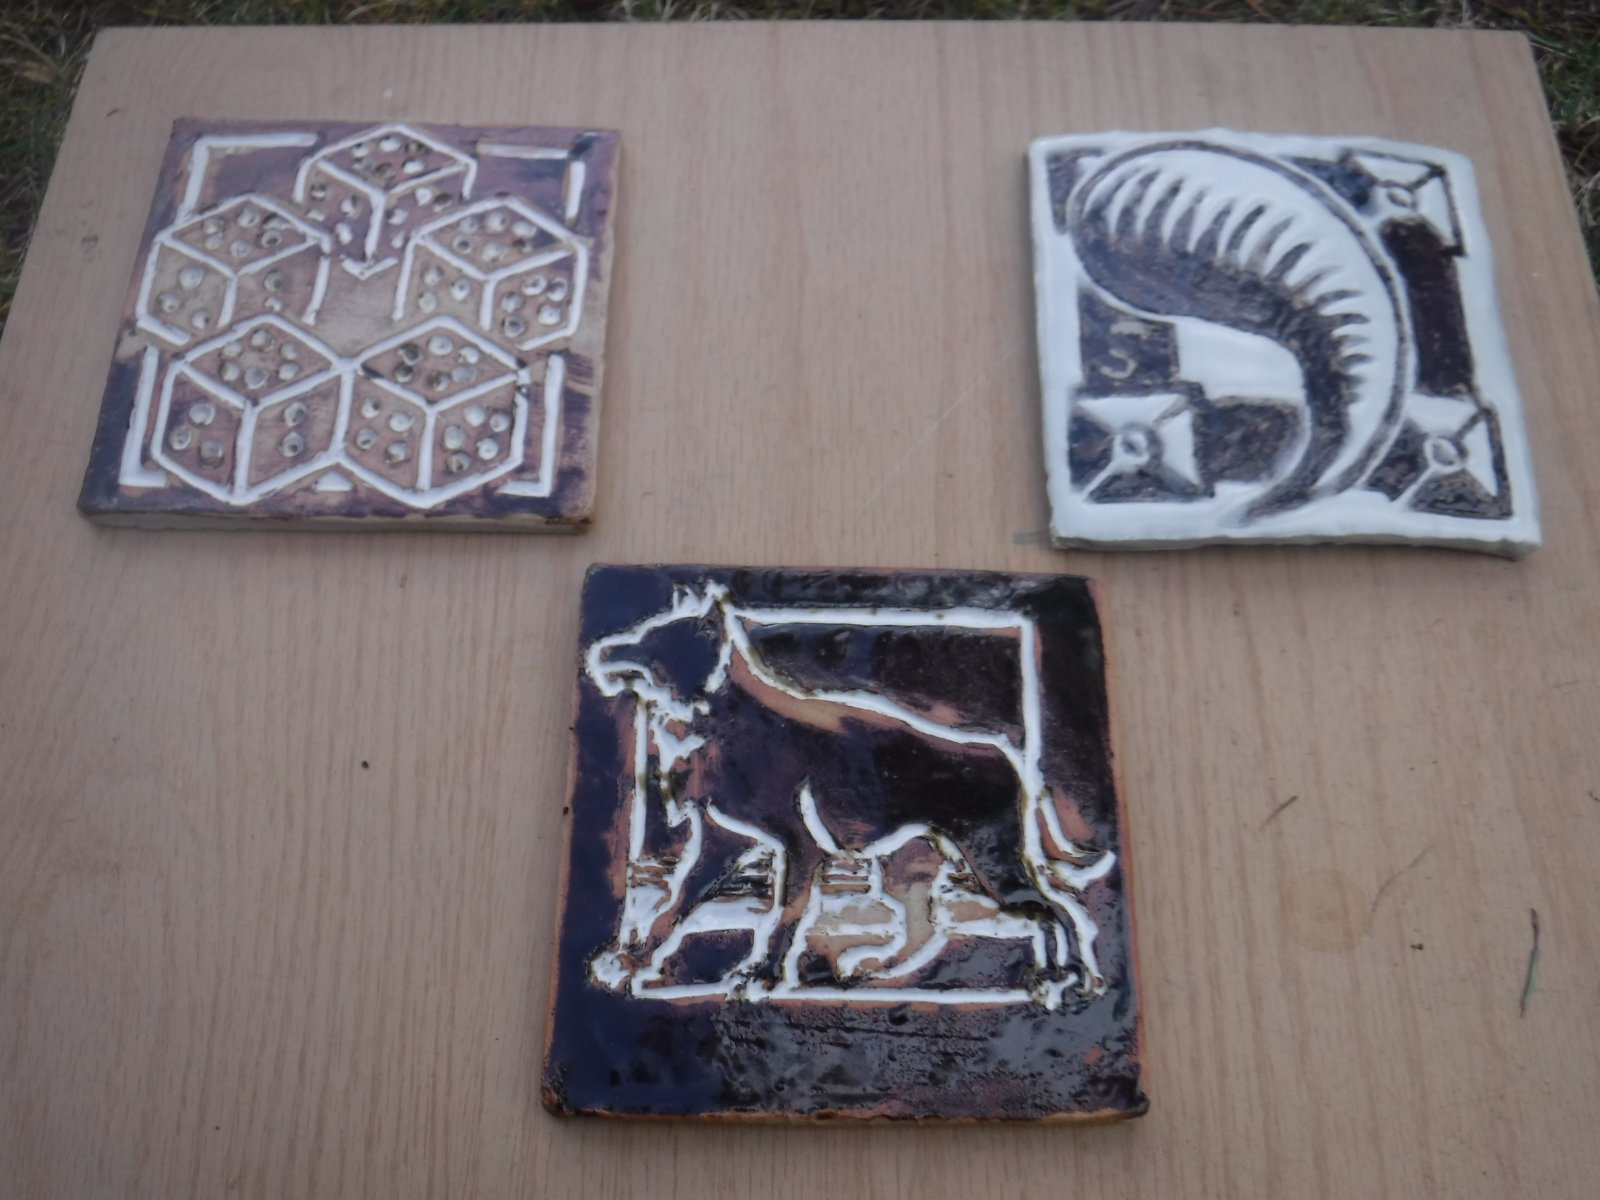 Three tiles